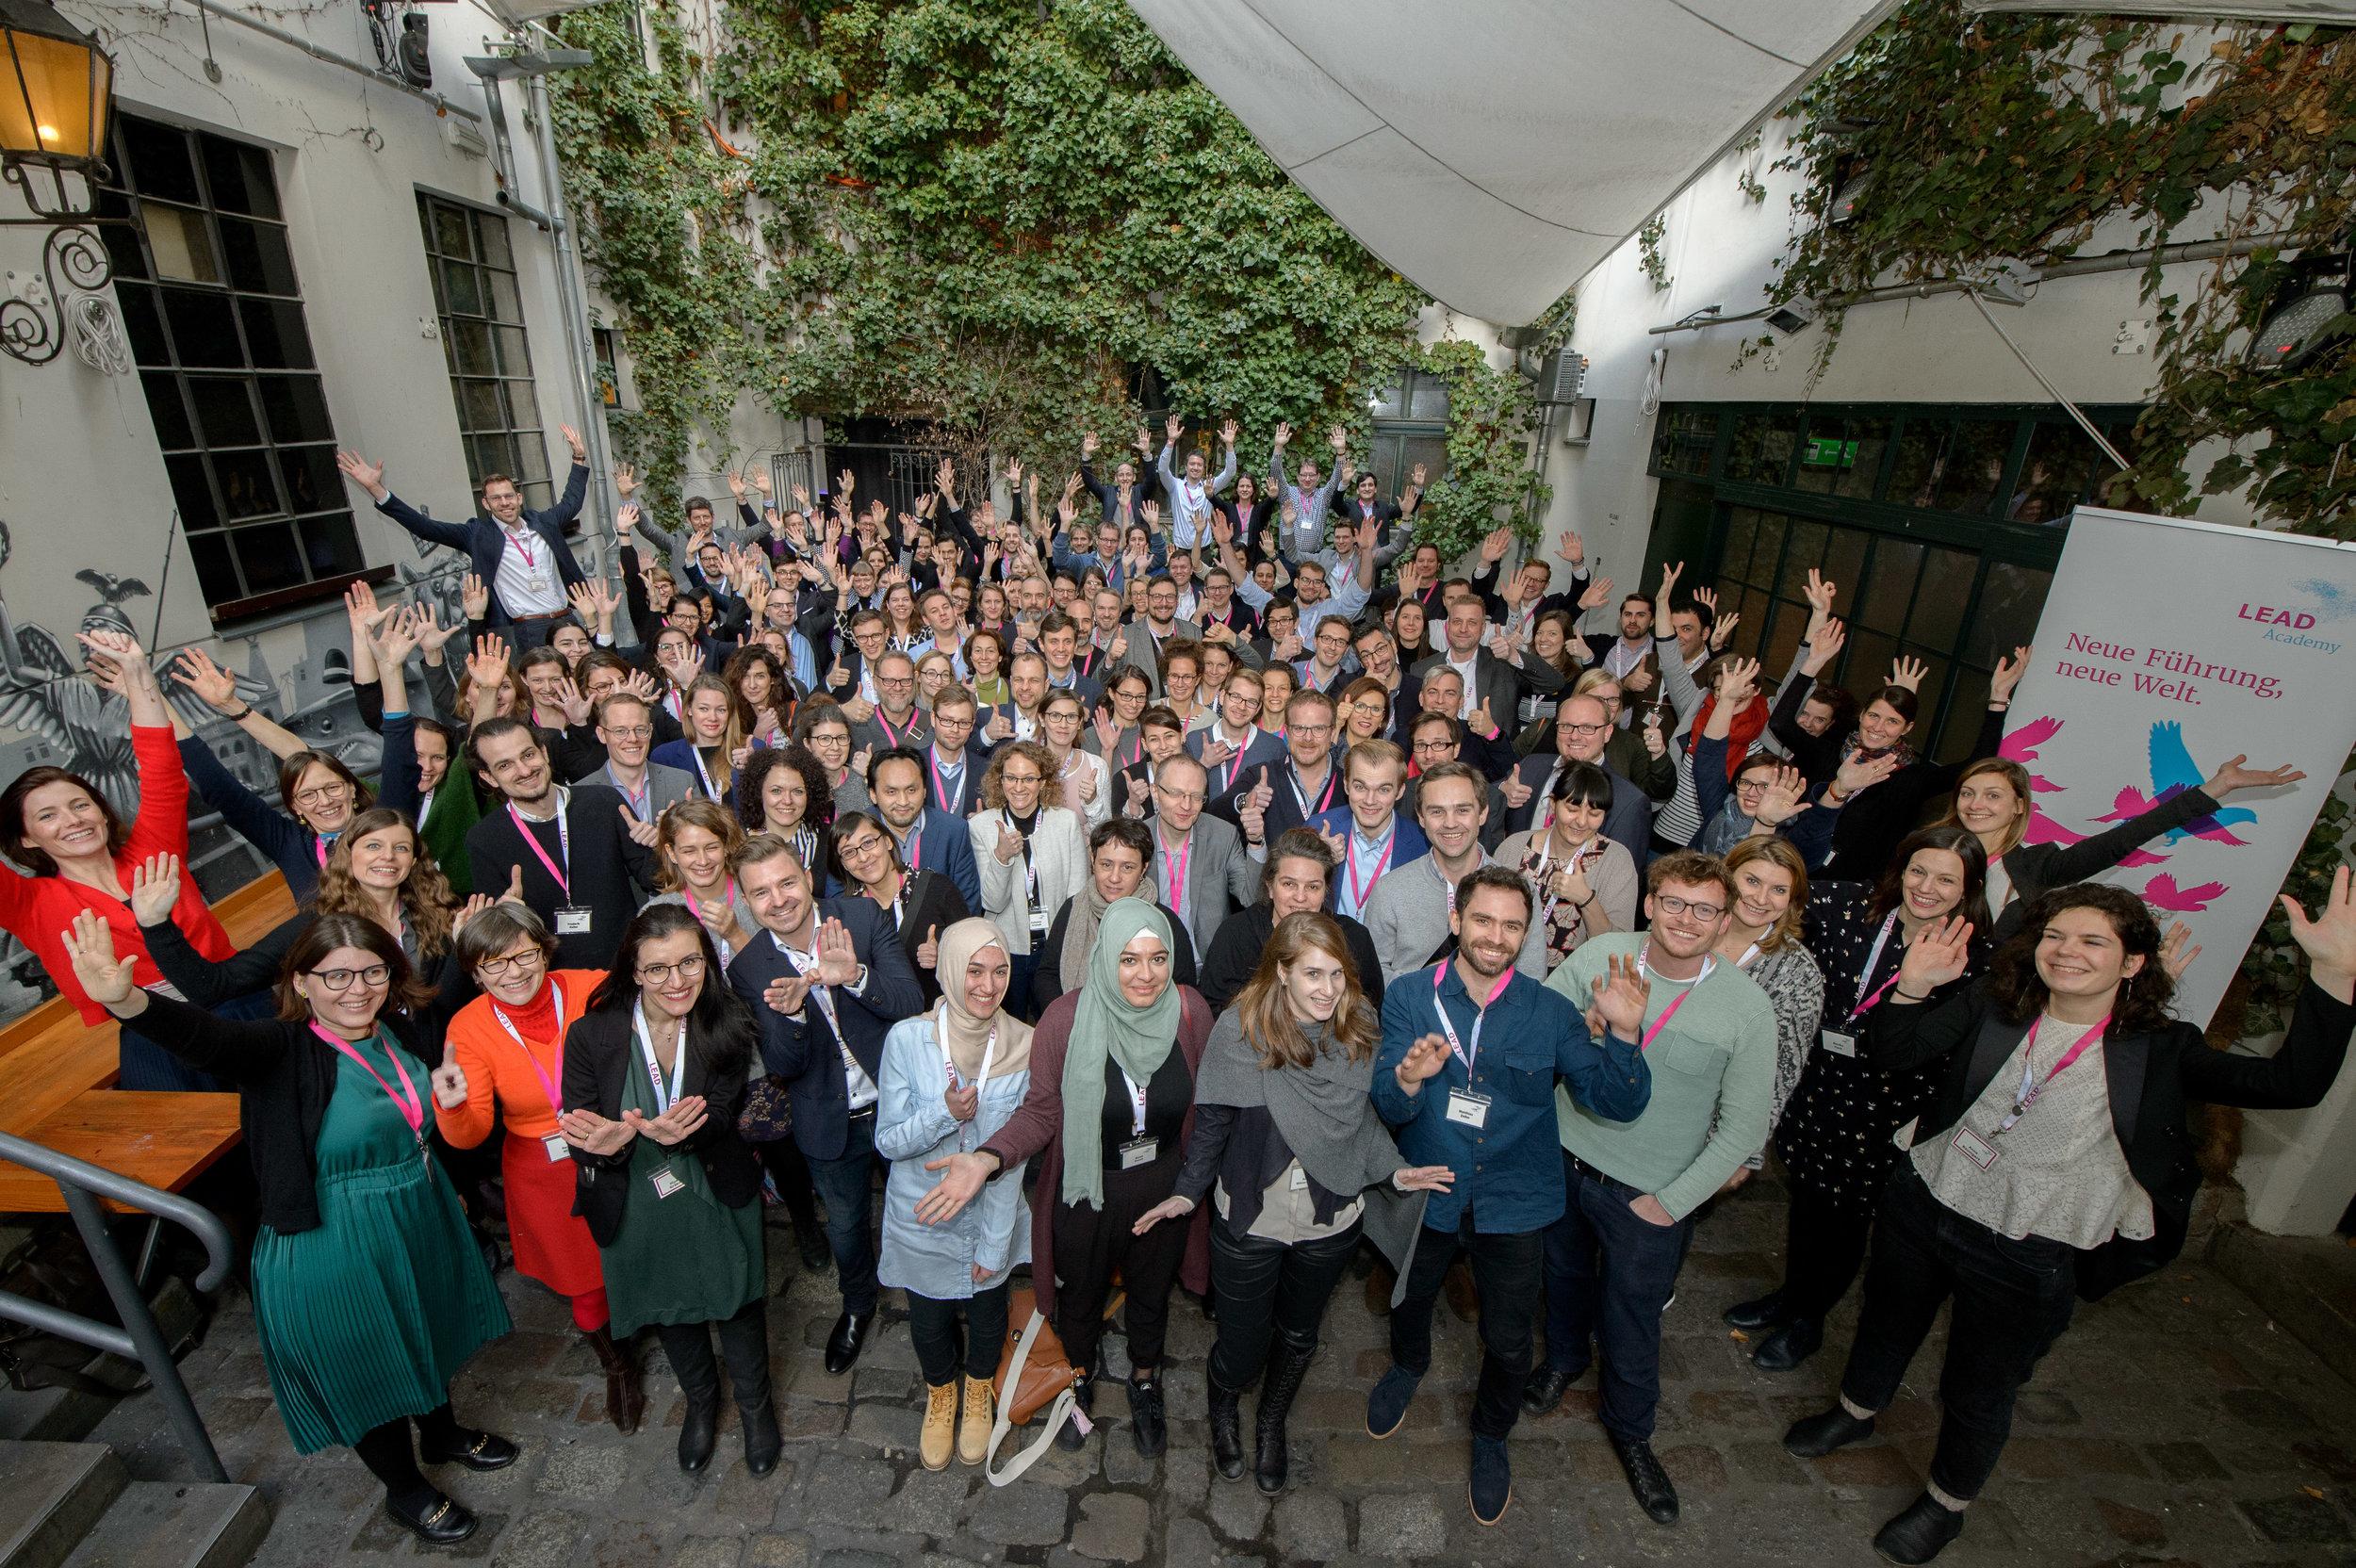 lead-community-summit-2018-group-photo-participants.jpg